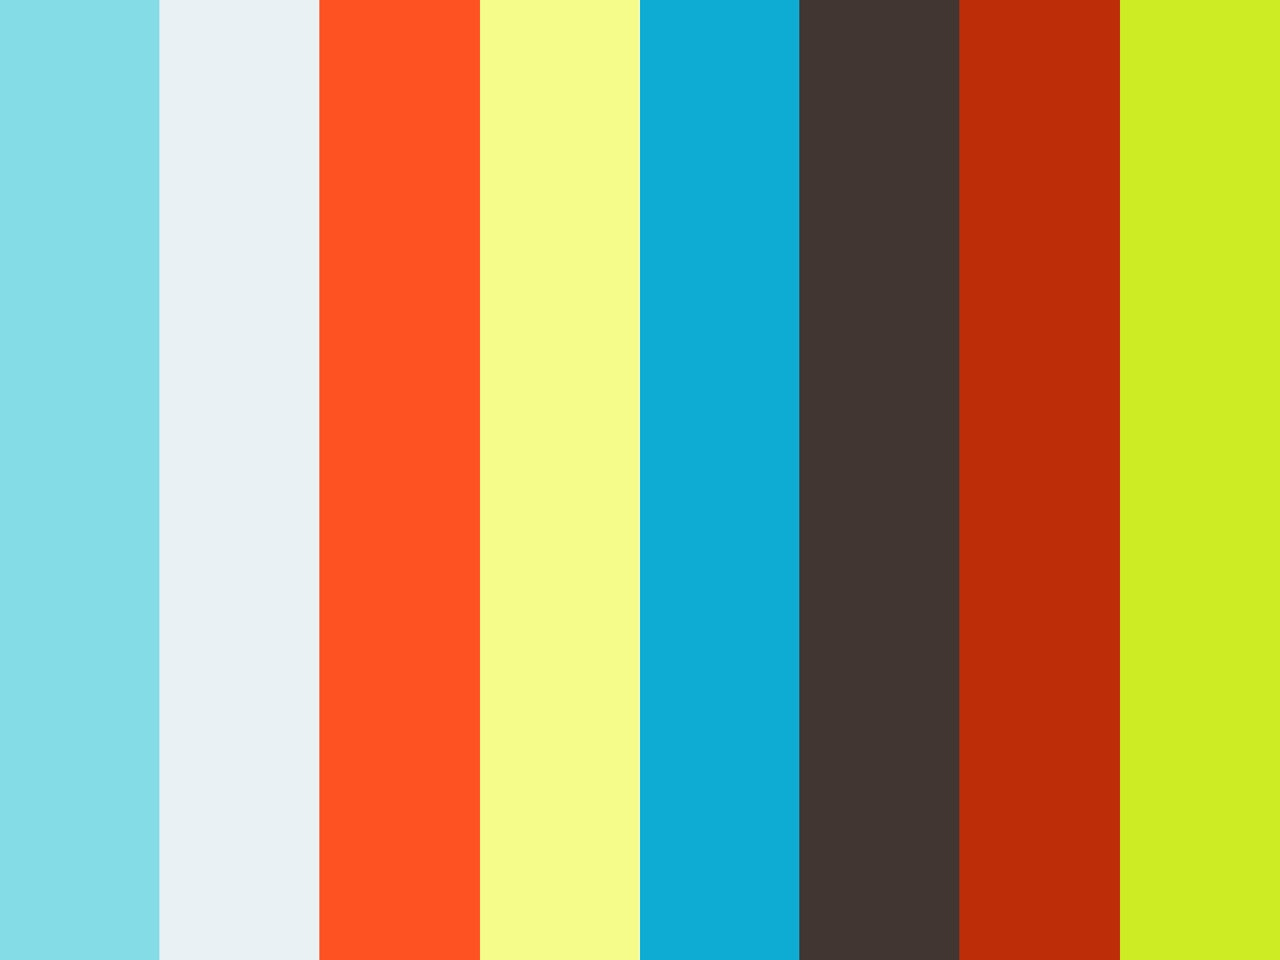 SOUMATO'S REEL 2015 [RETROSPECTIVE]